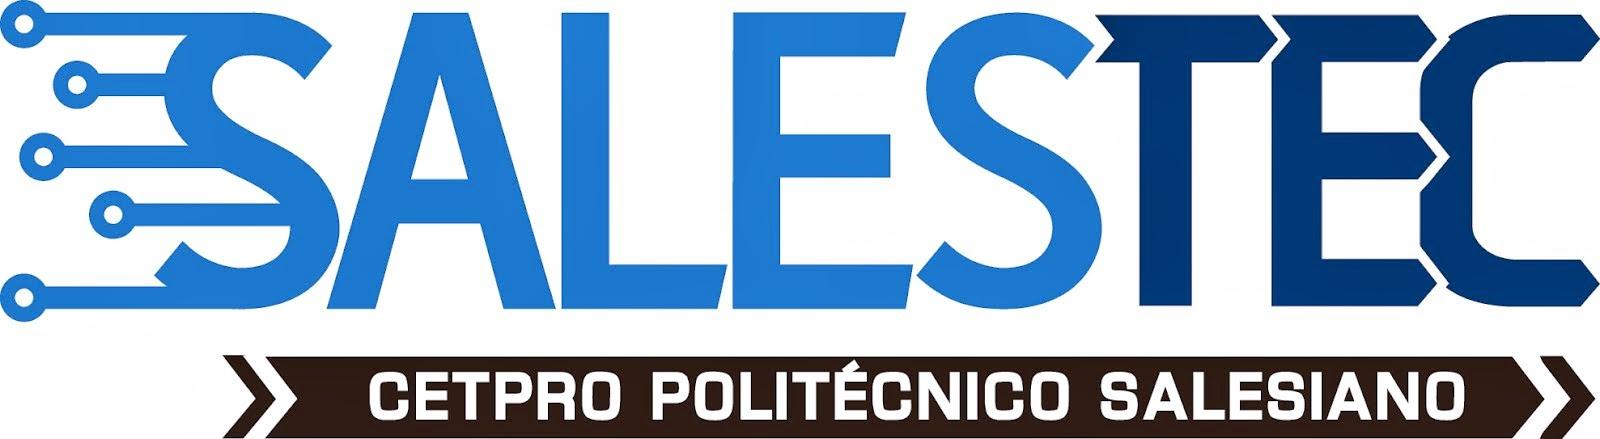 CETPRO POLITECNICO SALESIANO